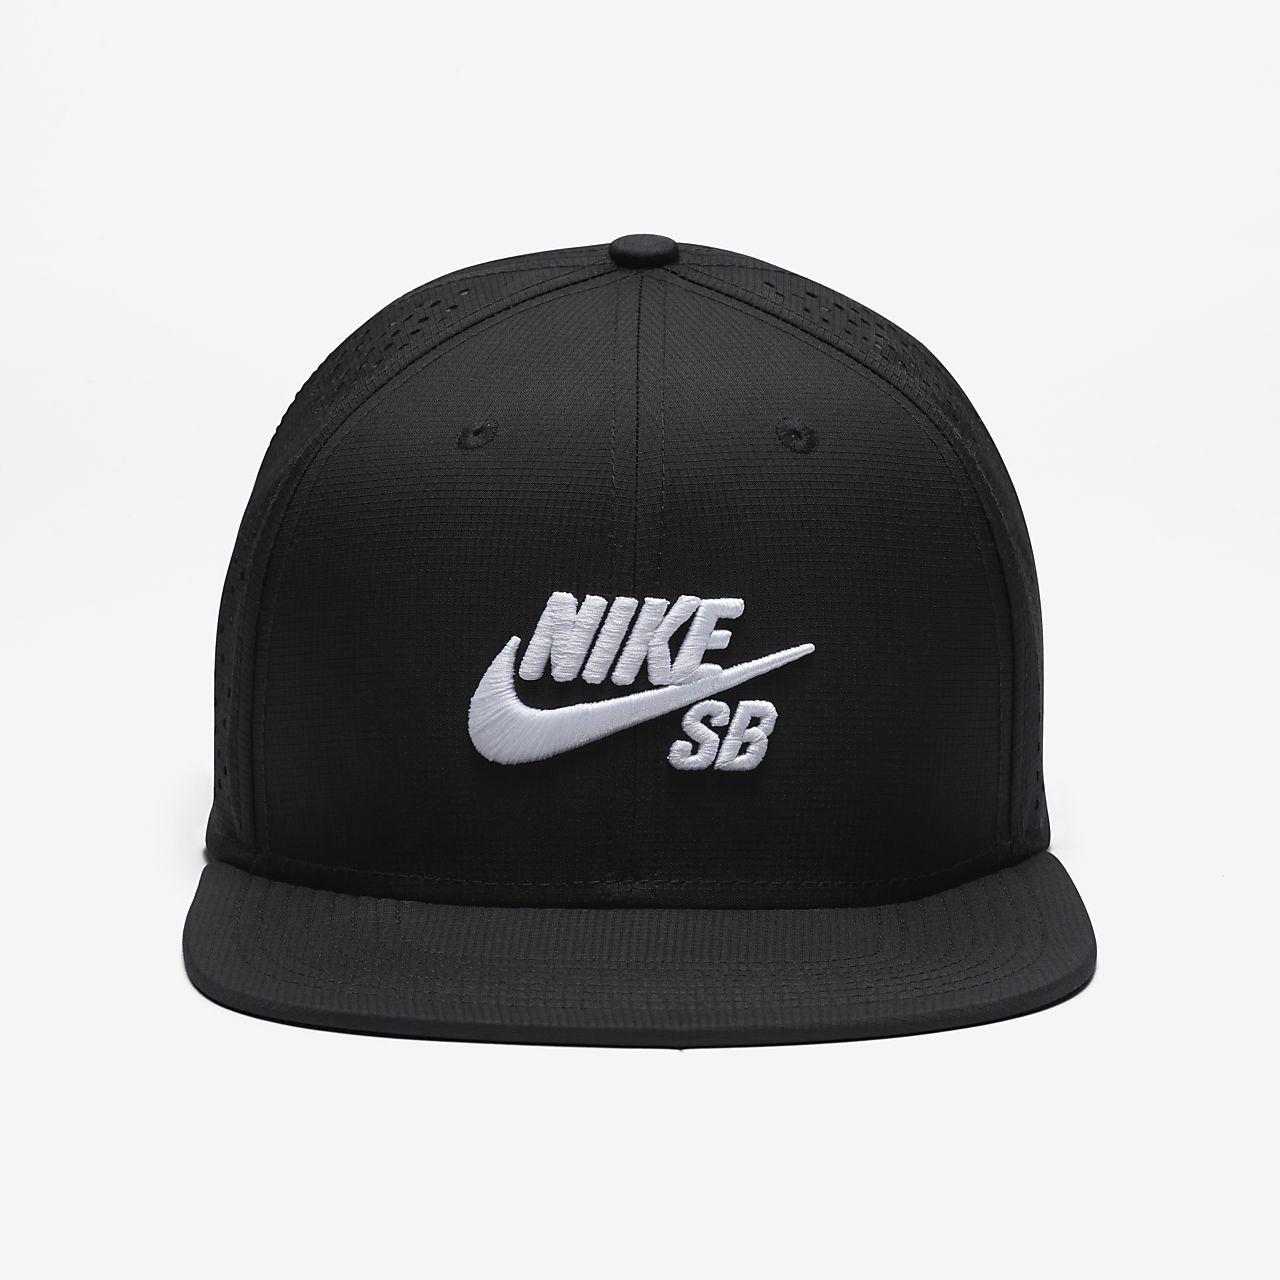 43686e163cae Nike SB Performance Trucker Hat. Nike.com VN